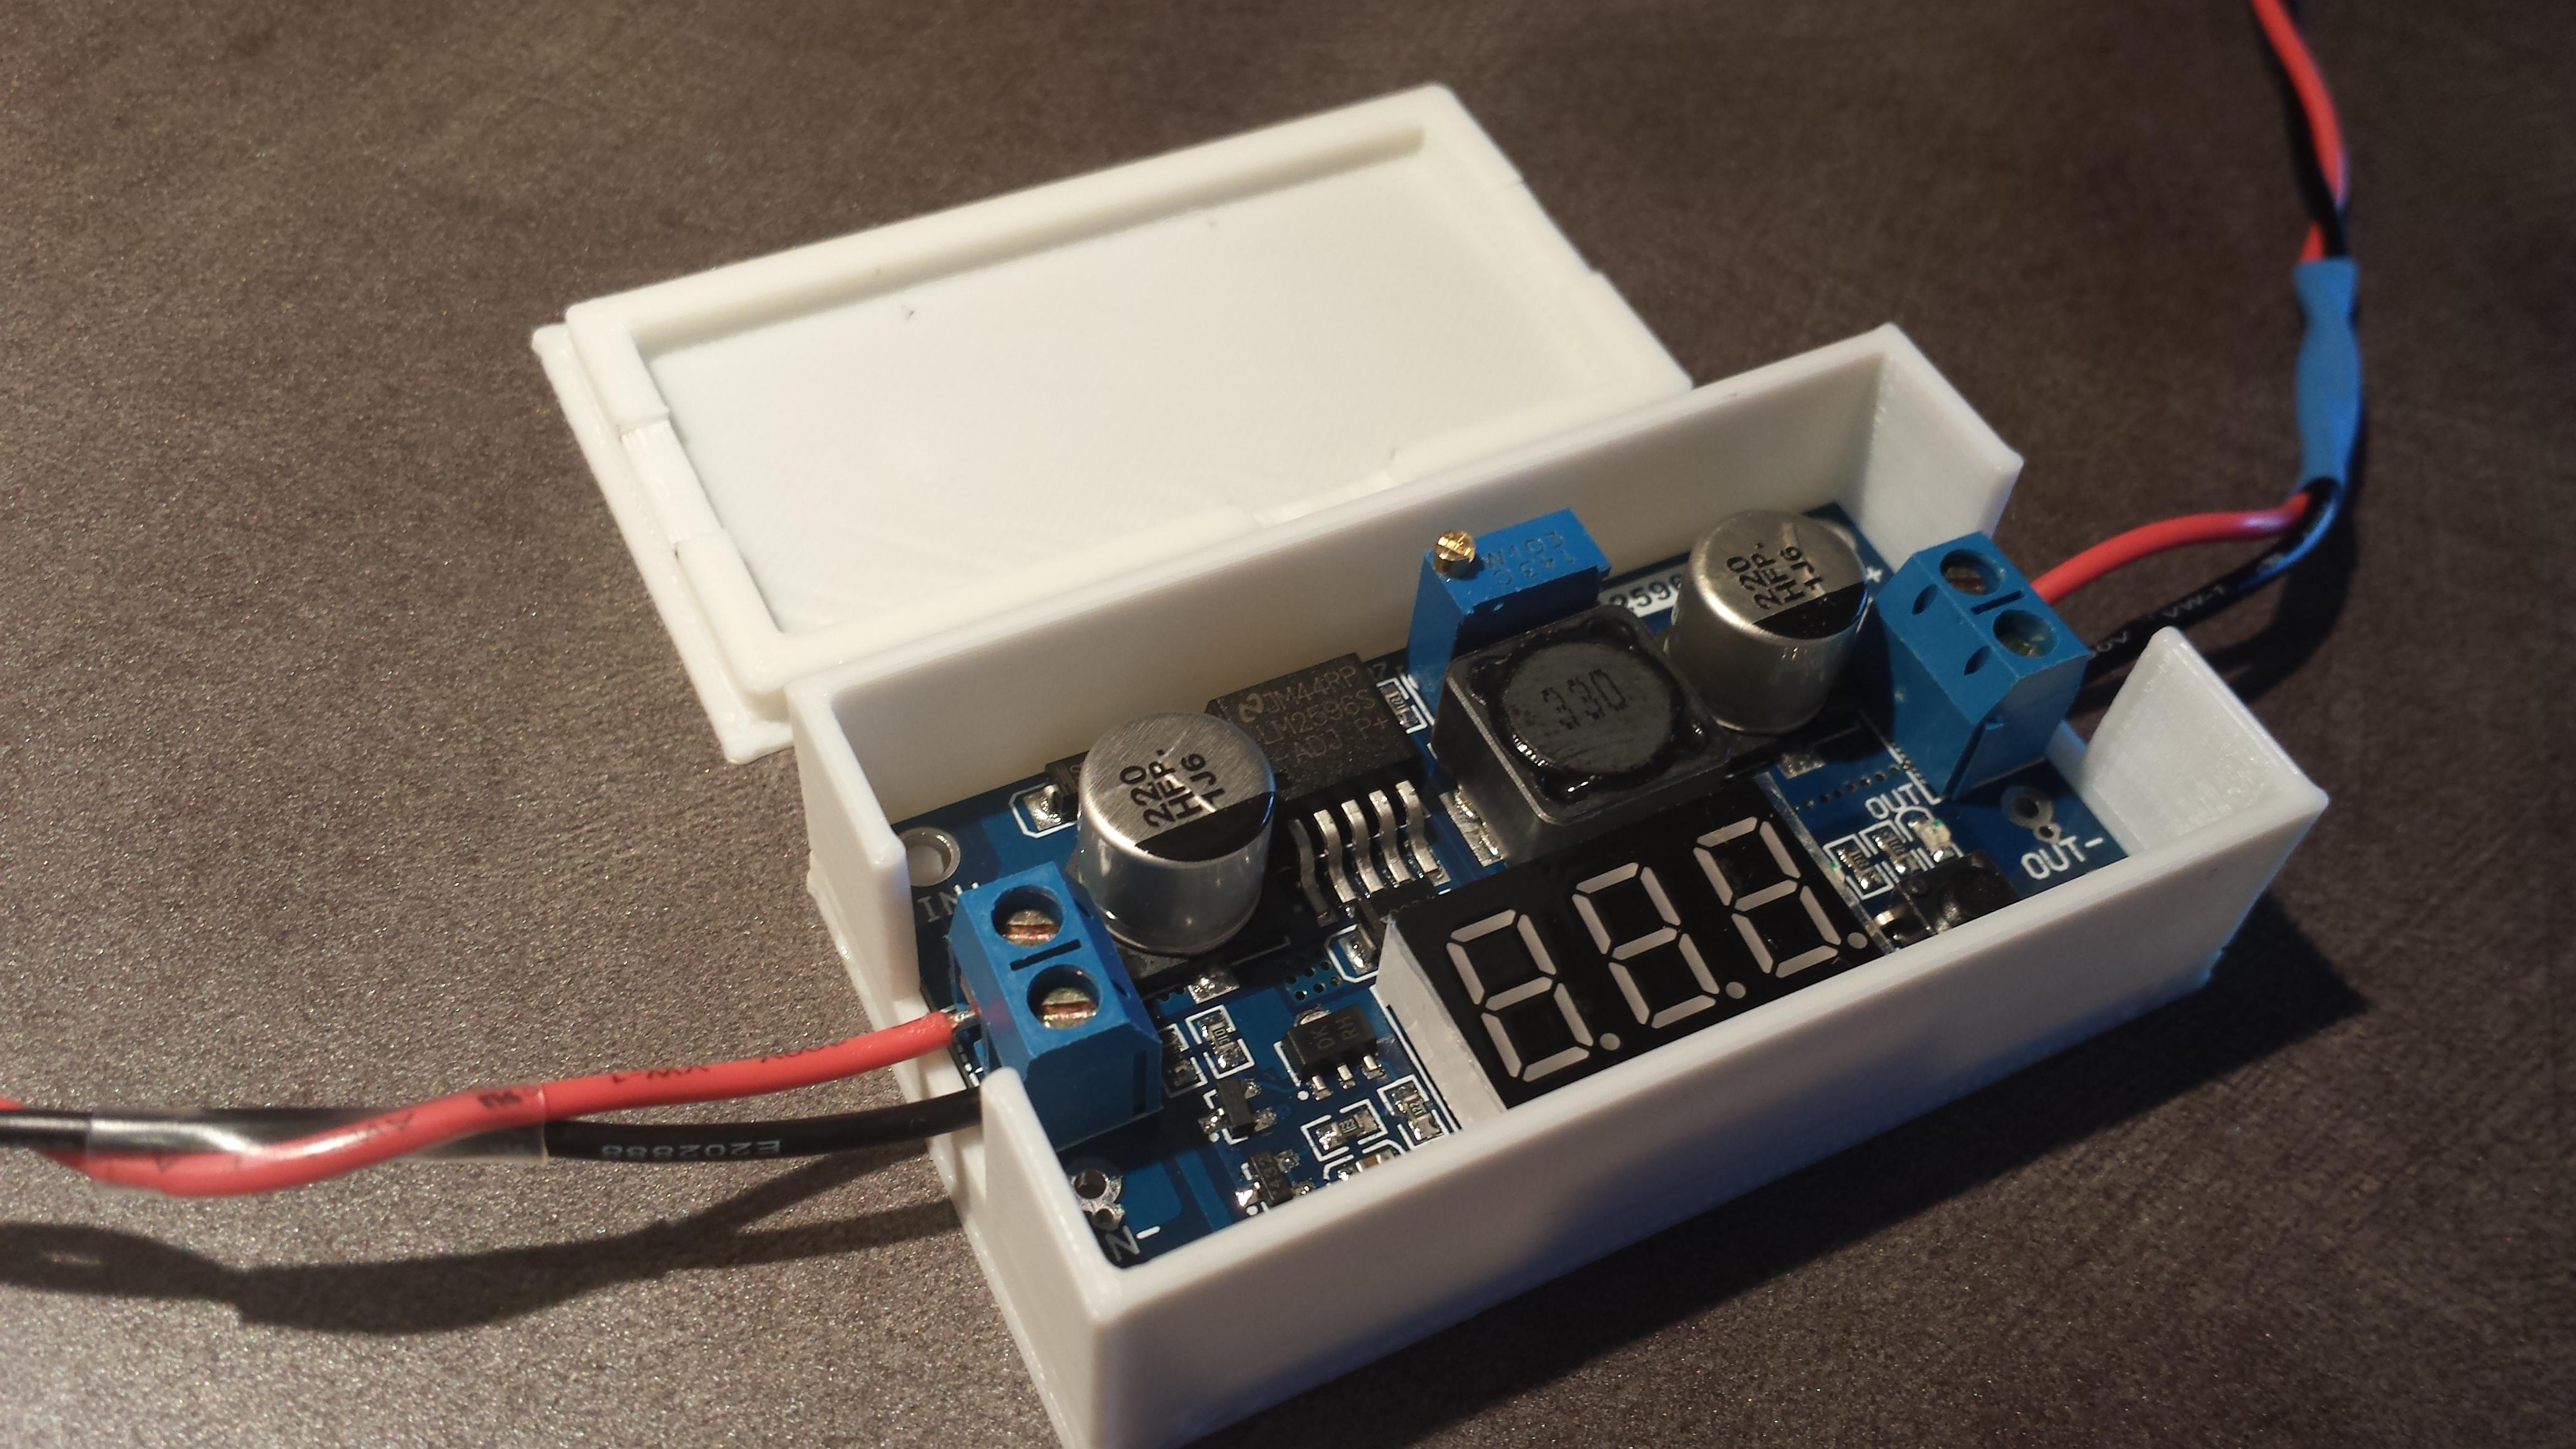 Case For Adjustable Voltage Regulator By Atomicflx Thingiverse Jul 22 2015 View Original